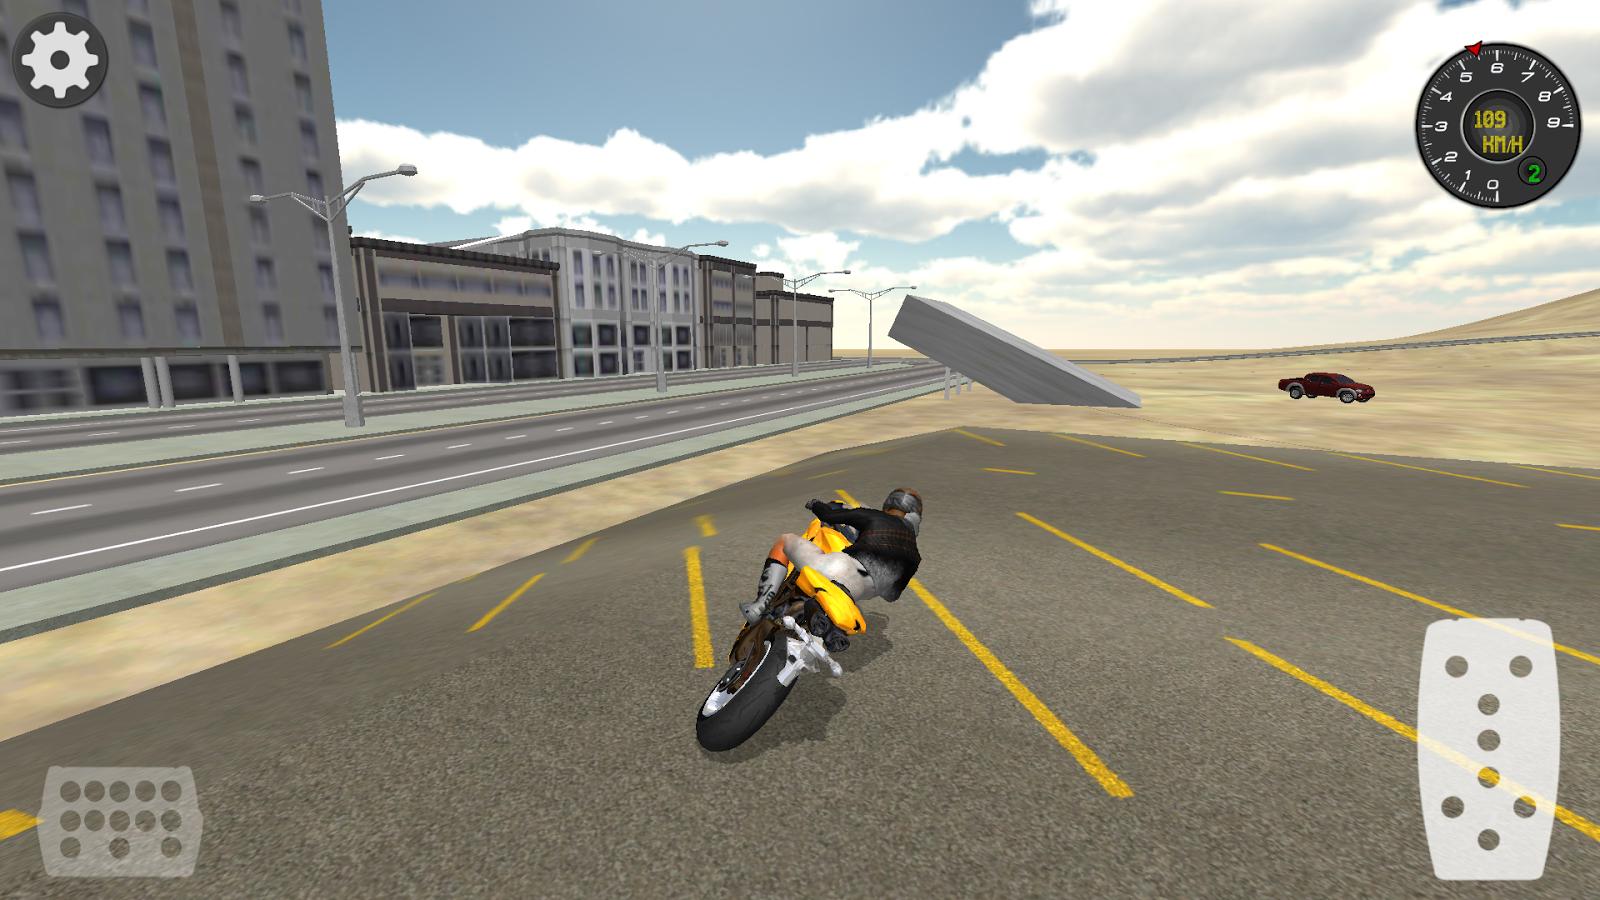 Motor Bike Crush Simulator 3d Android Apps On Google Play